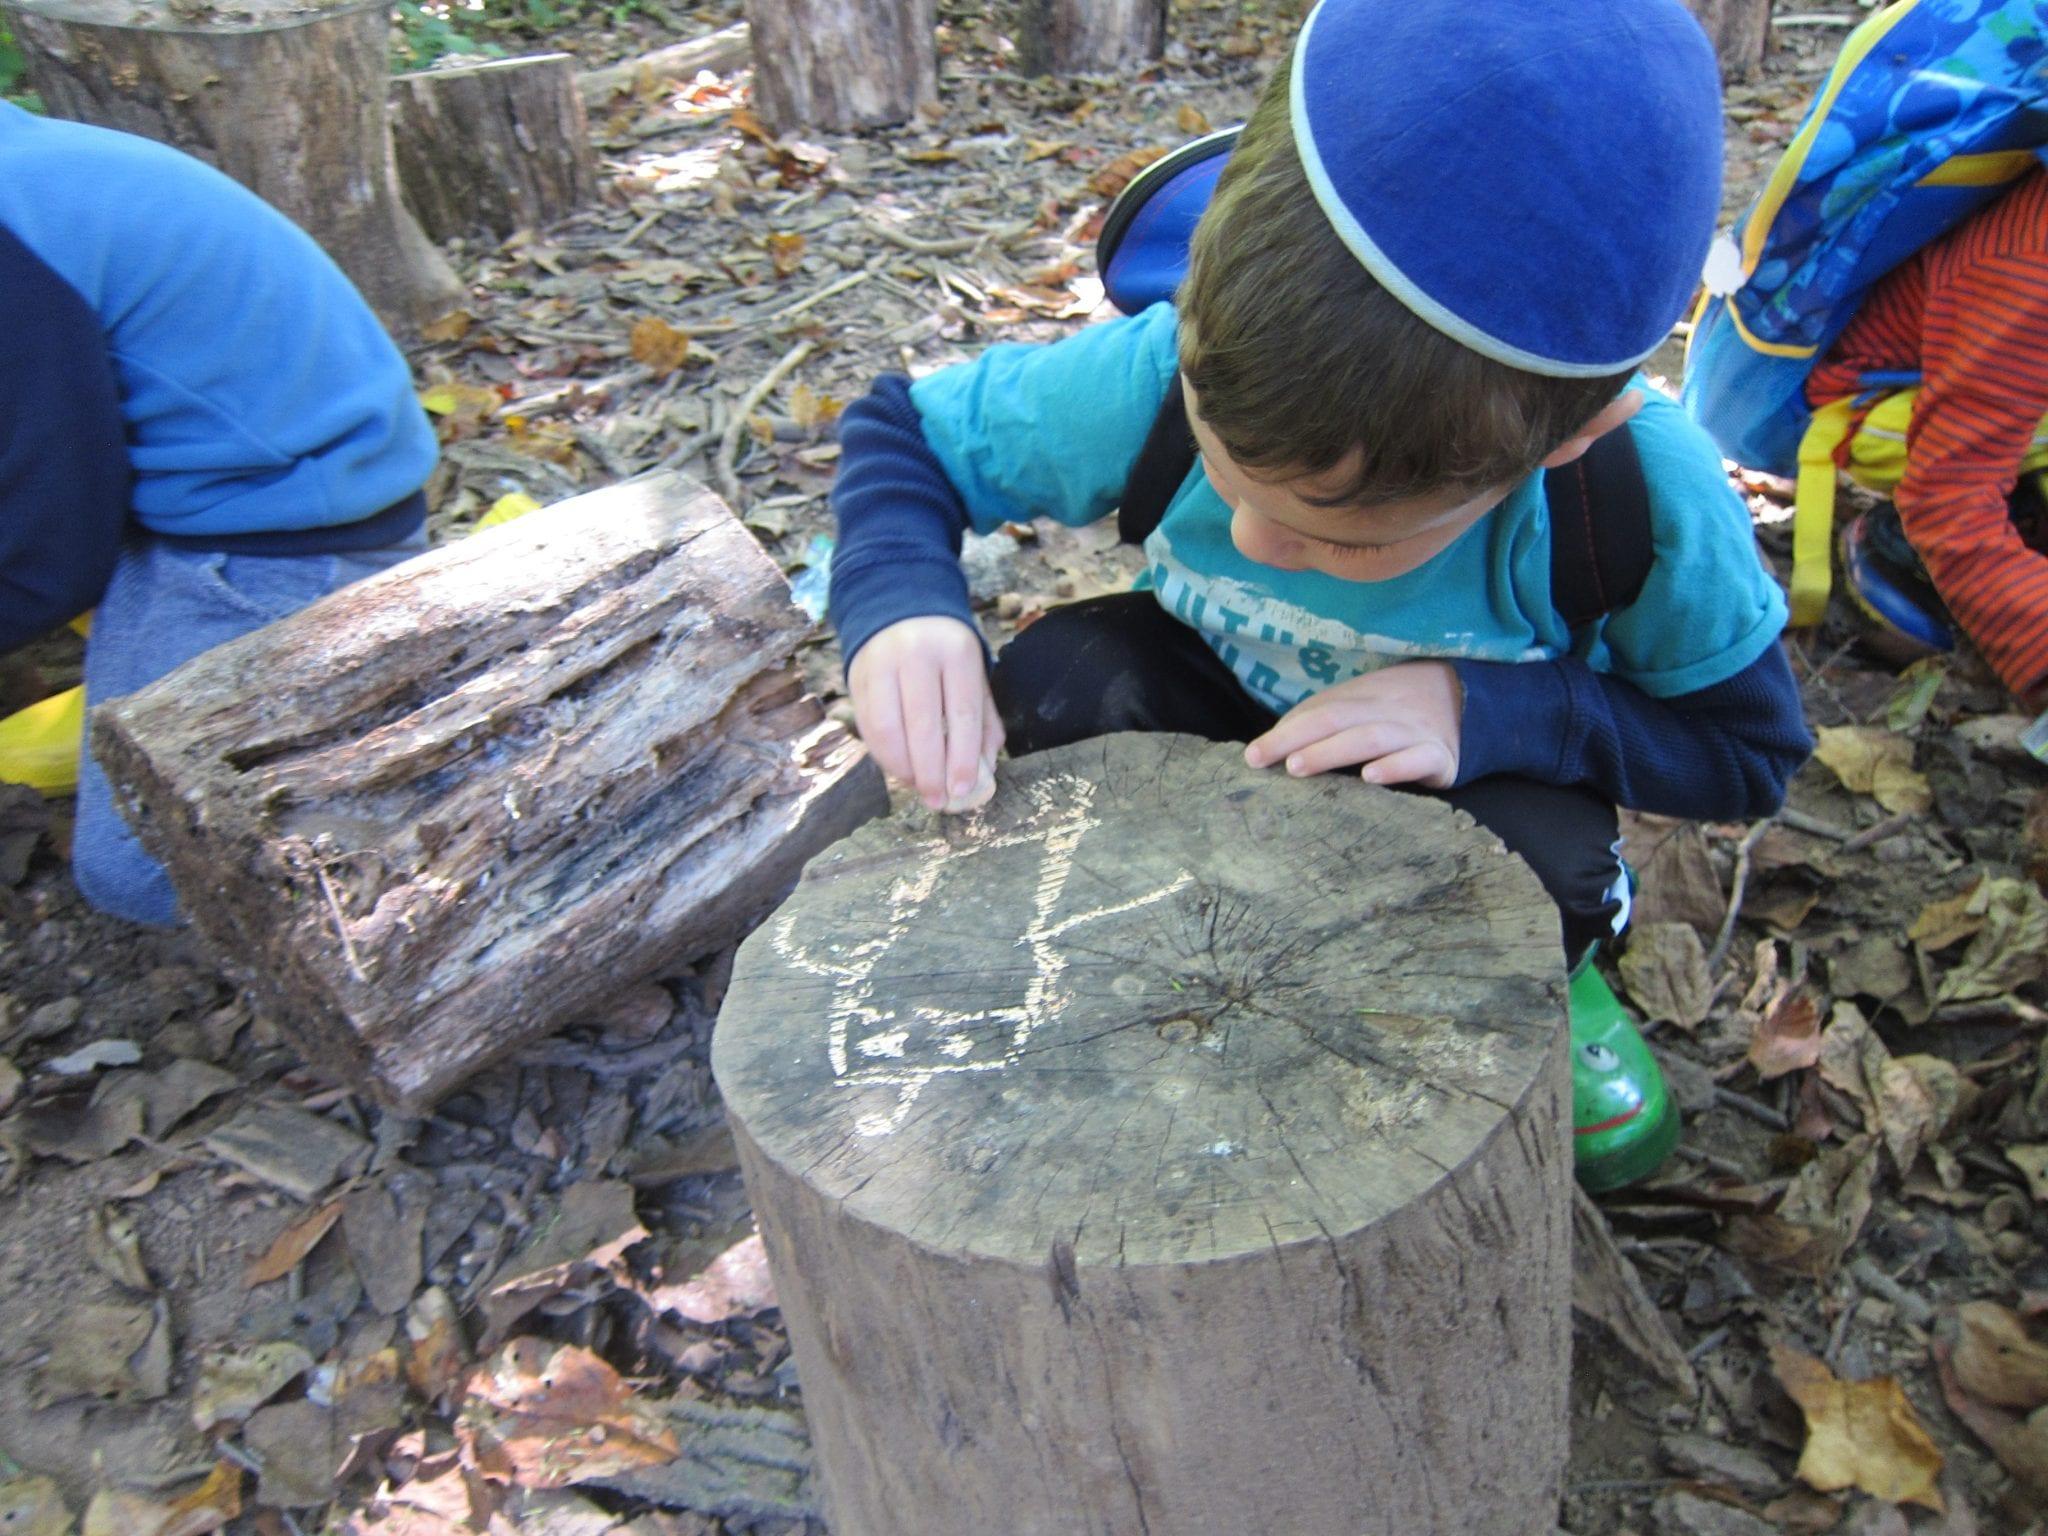 Noam decorating stump irvine nature center - Stump decorating ideas inspiration from nature ...